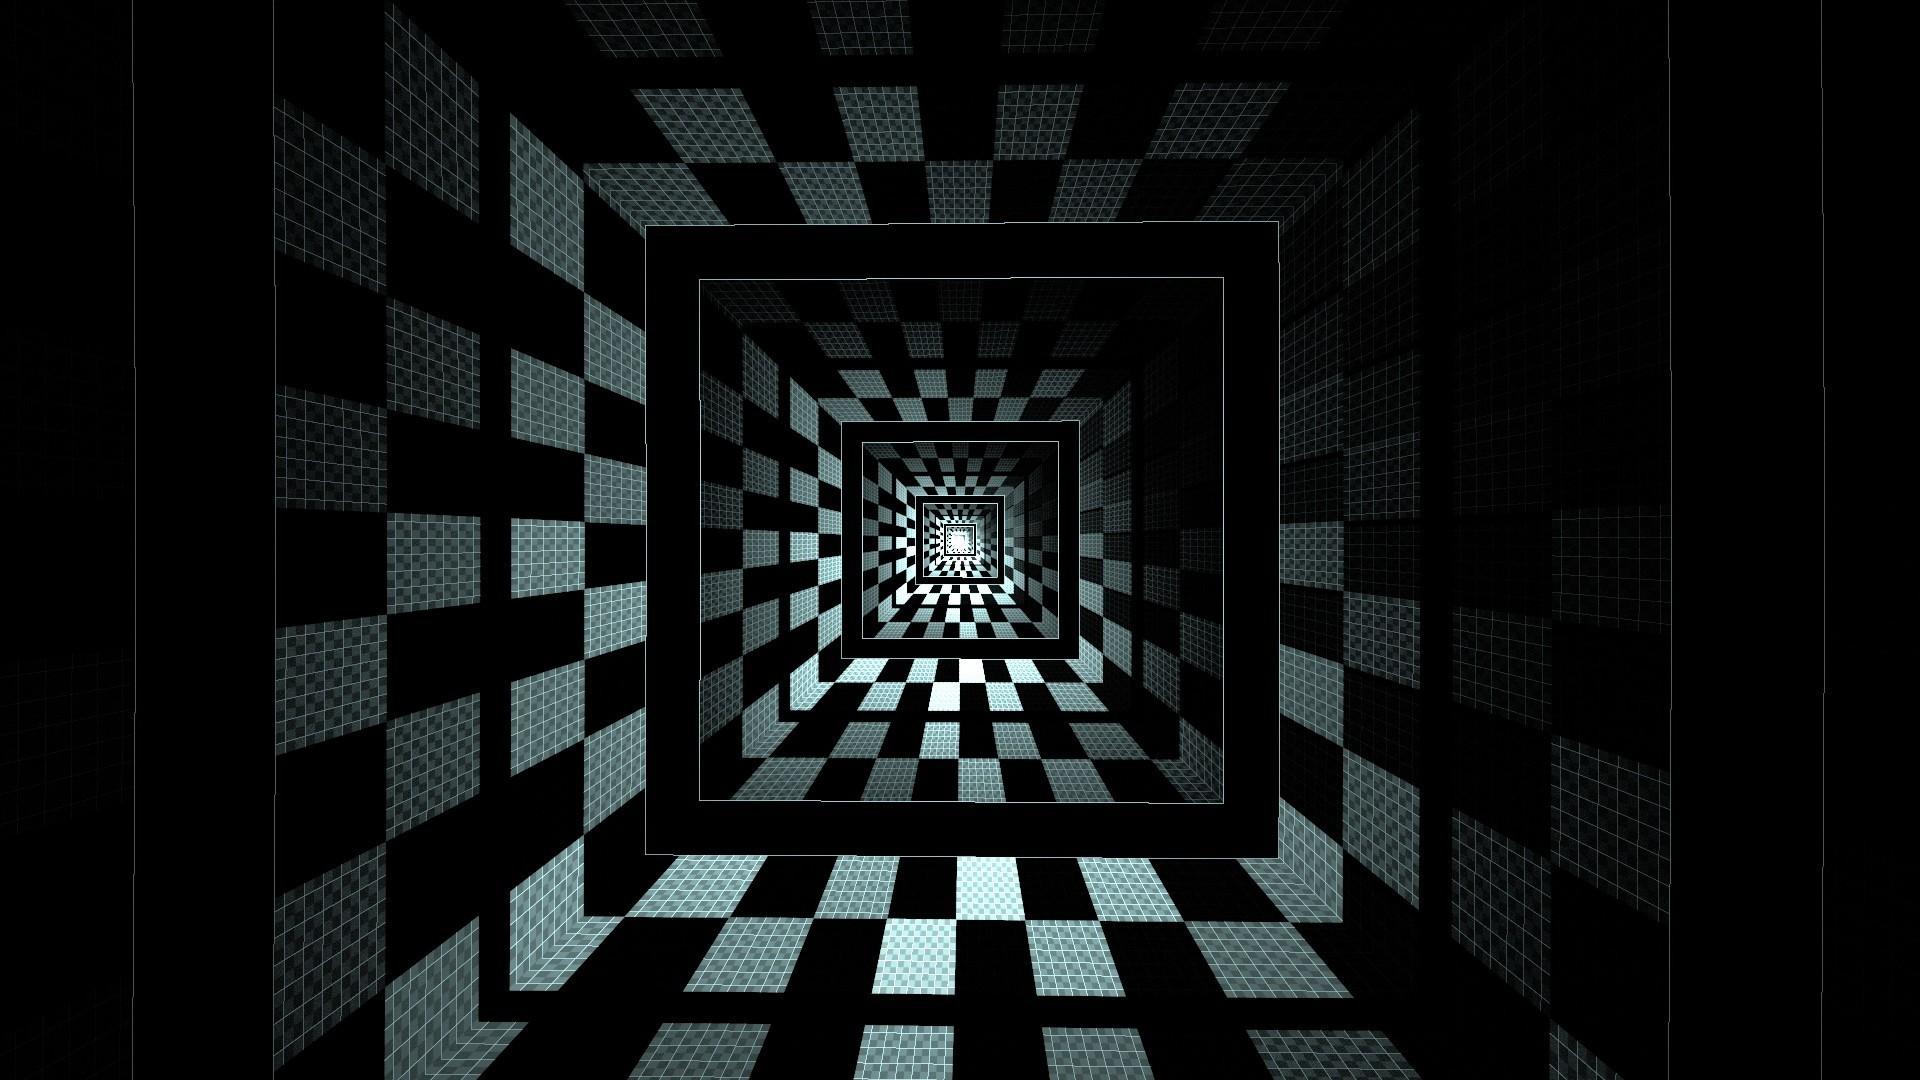 Fantom xp wallpaper 53 images - Optical illusion wallpaper hd ...